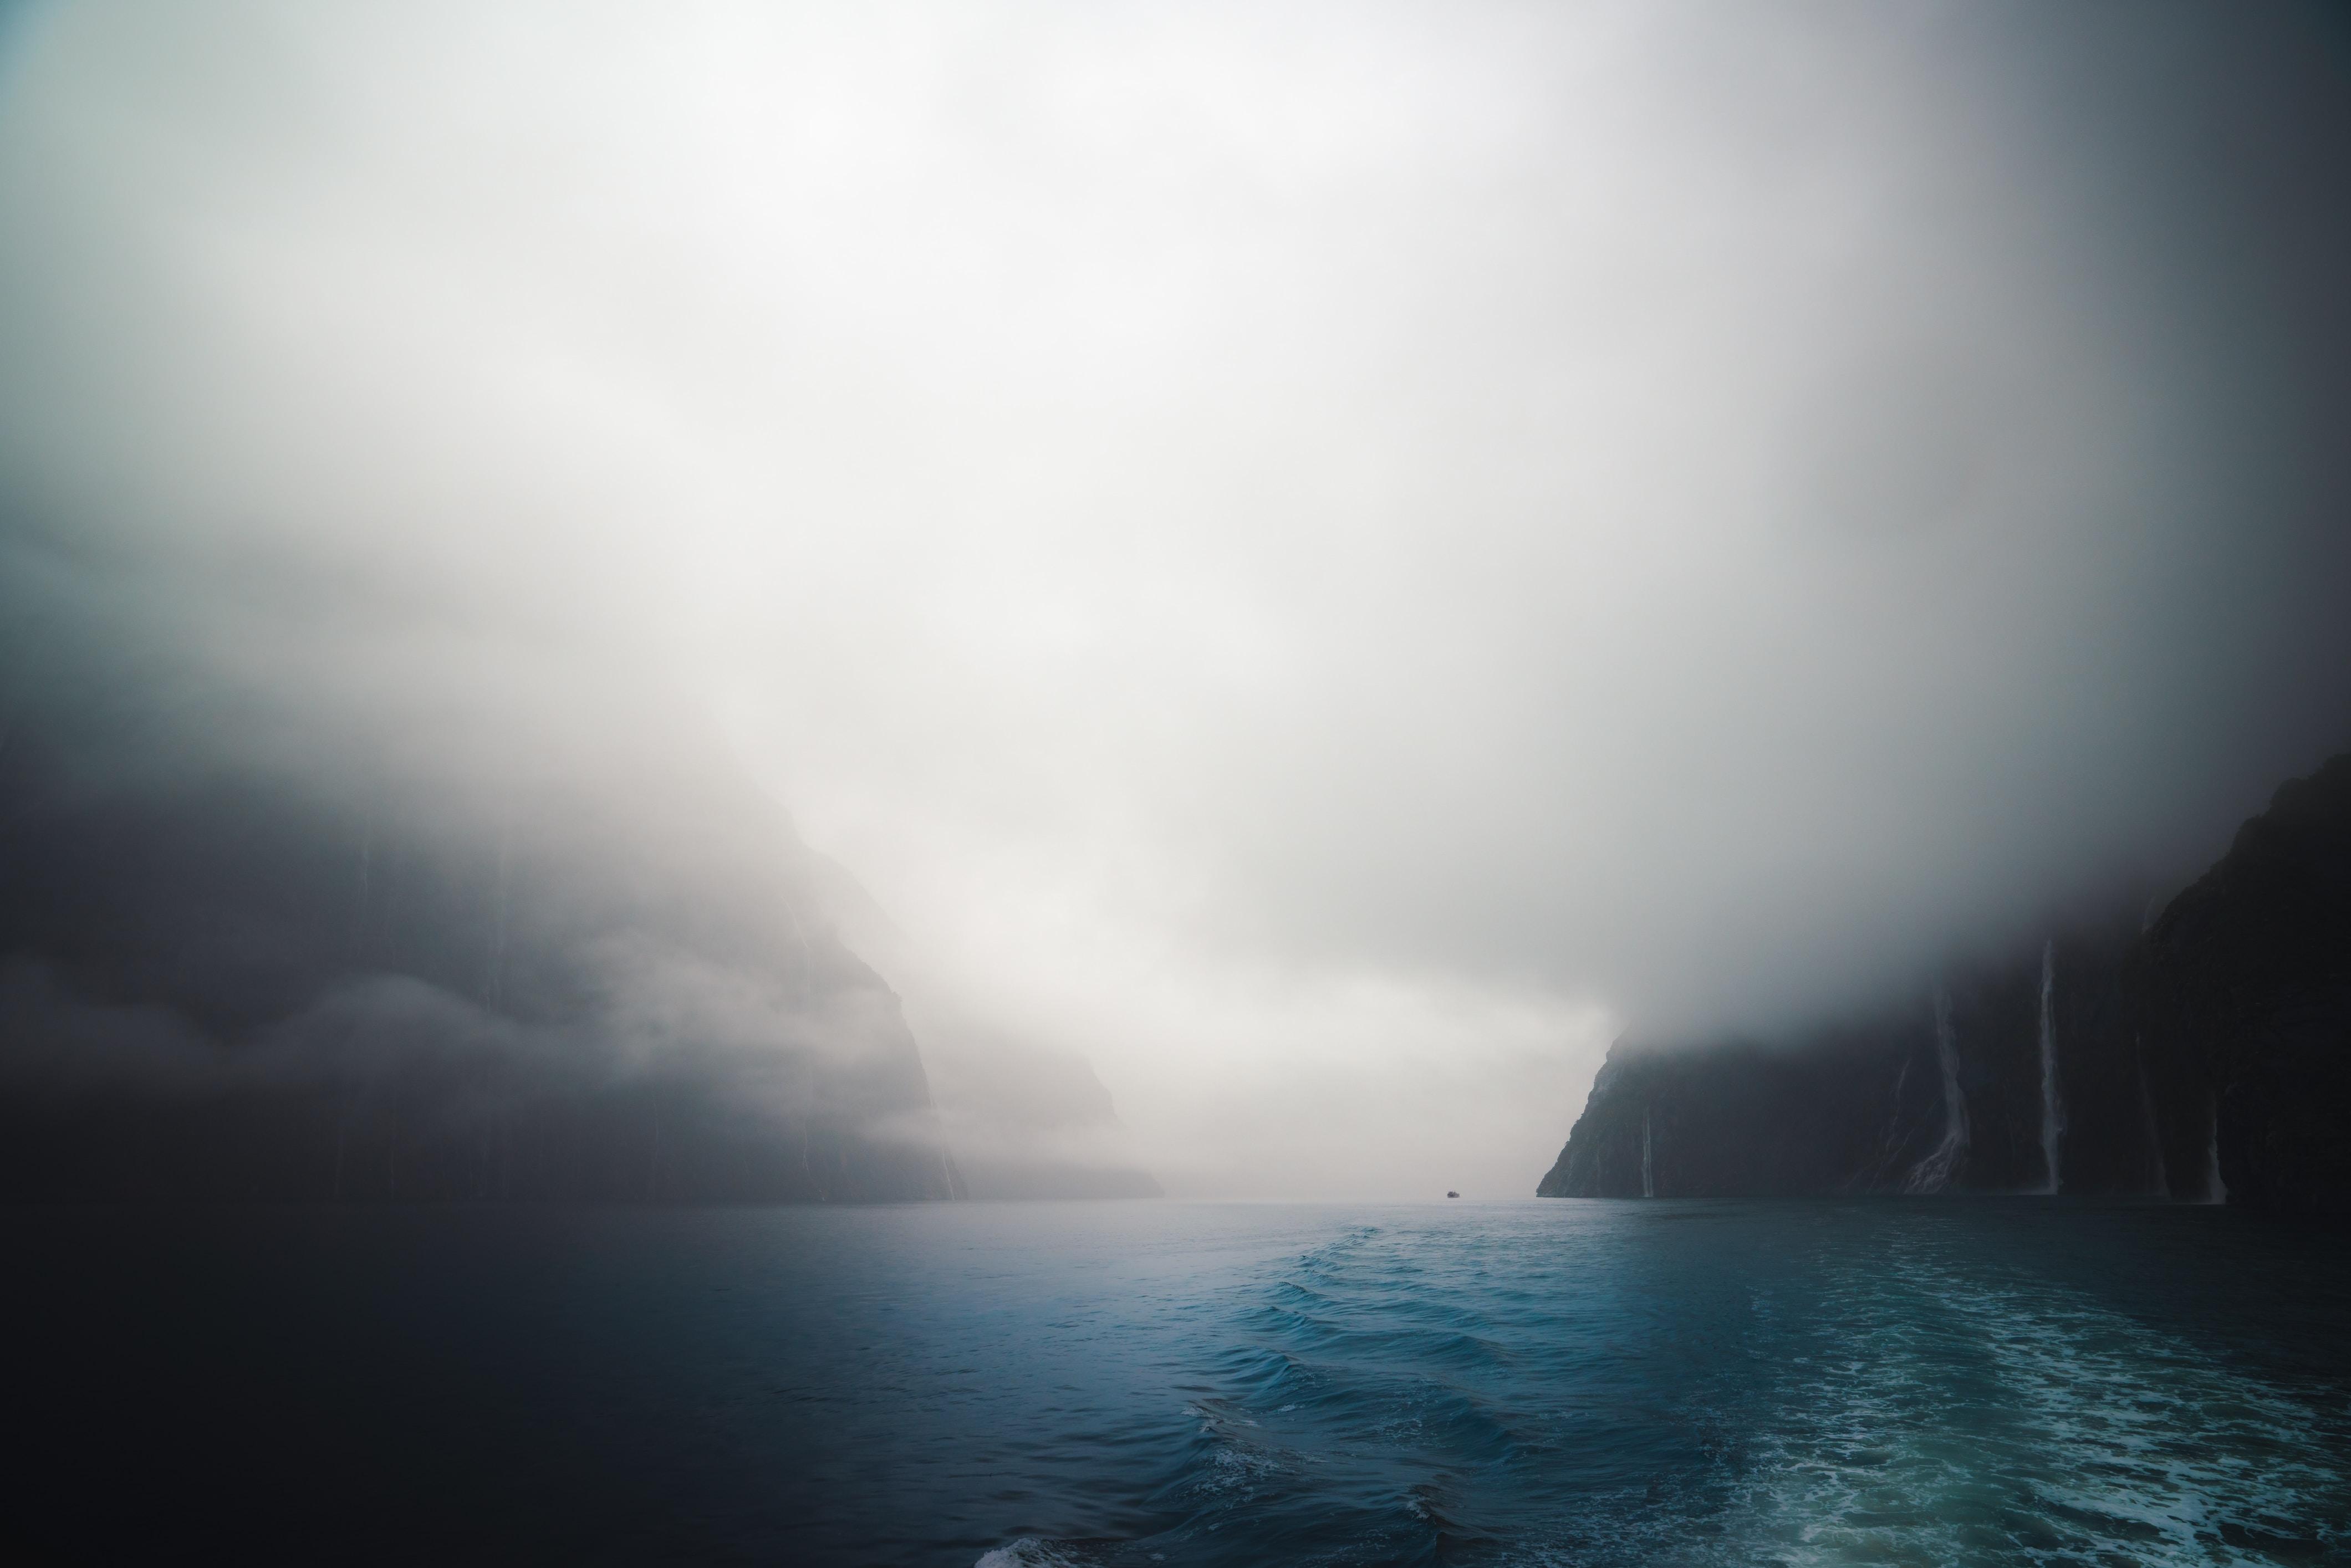 cloudy sea waves